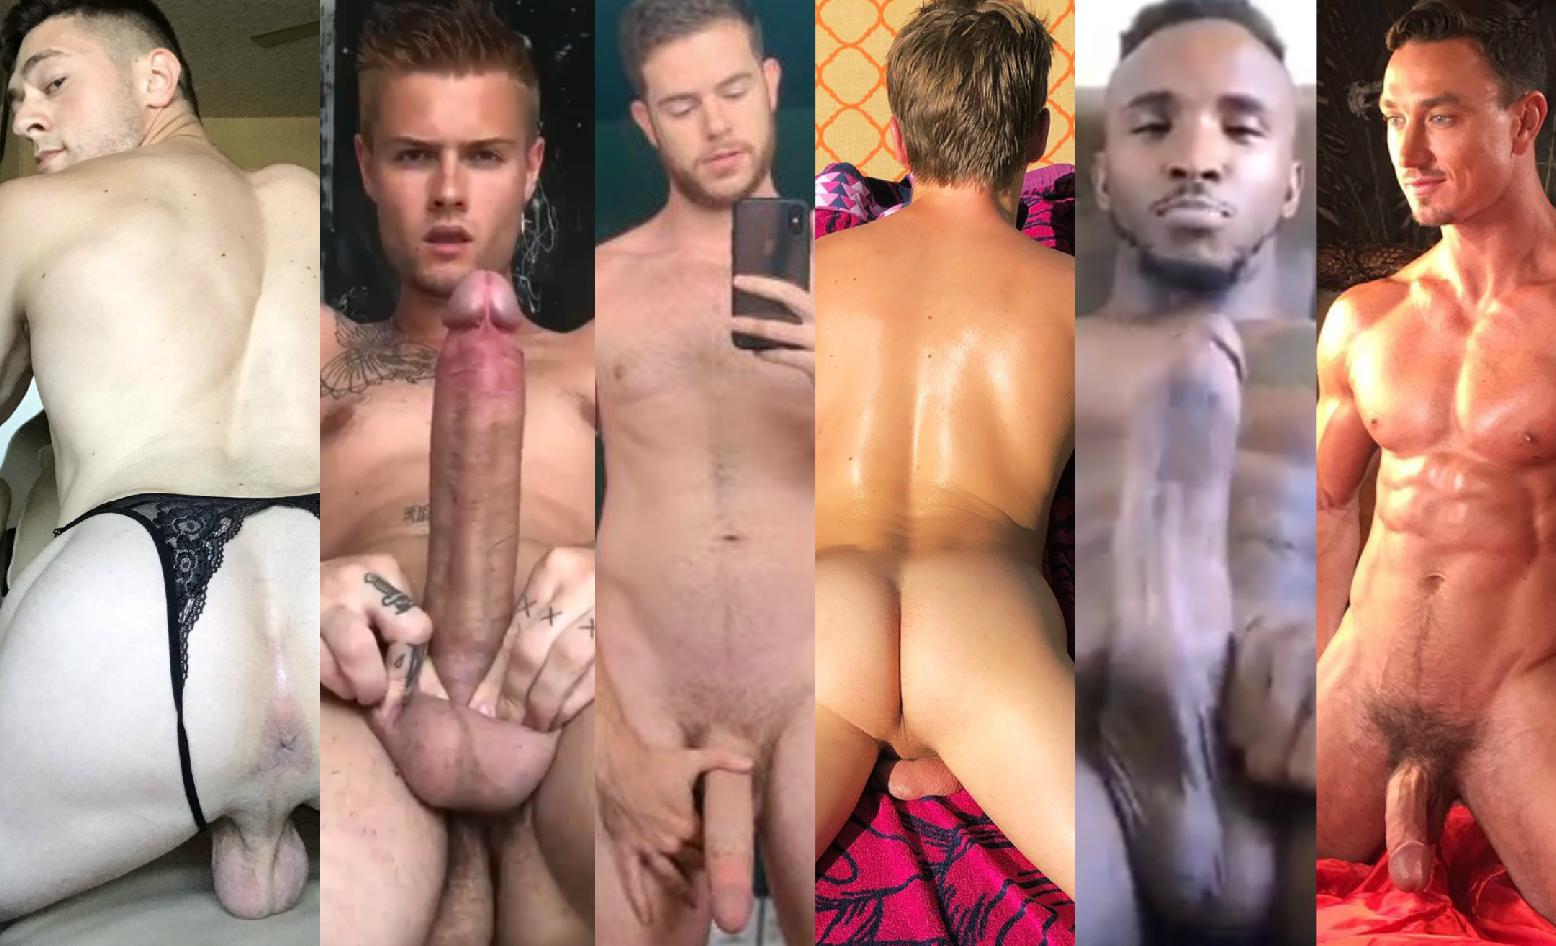 gay porn star cock shots